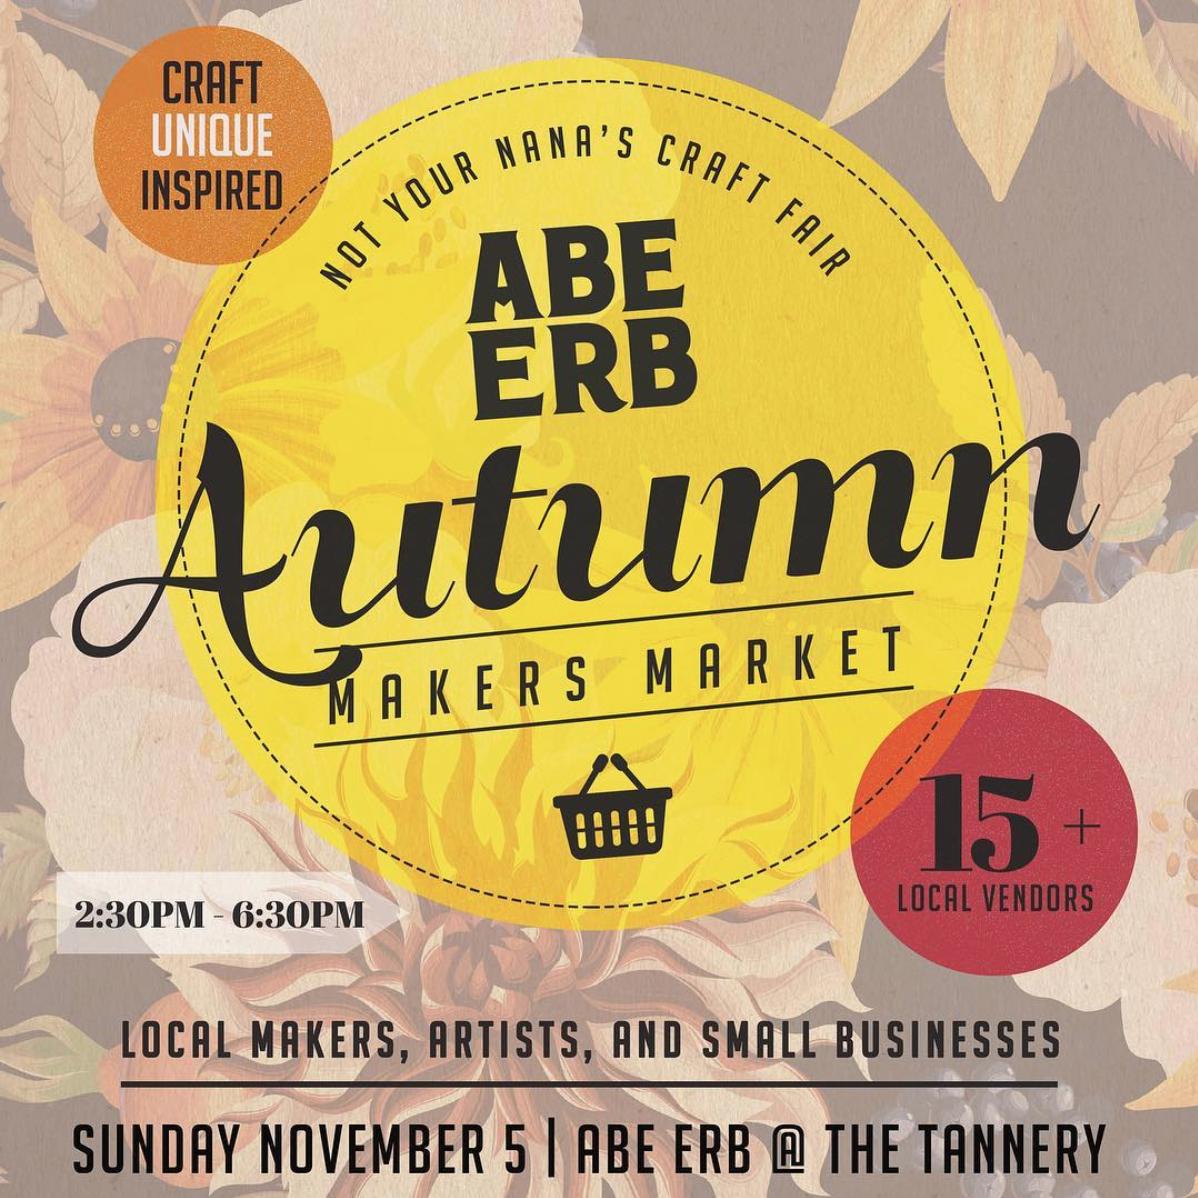 Autumn Makers Market.png